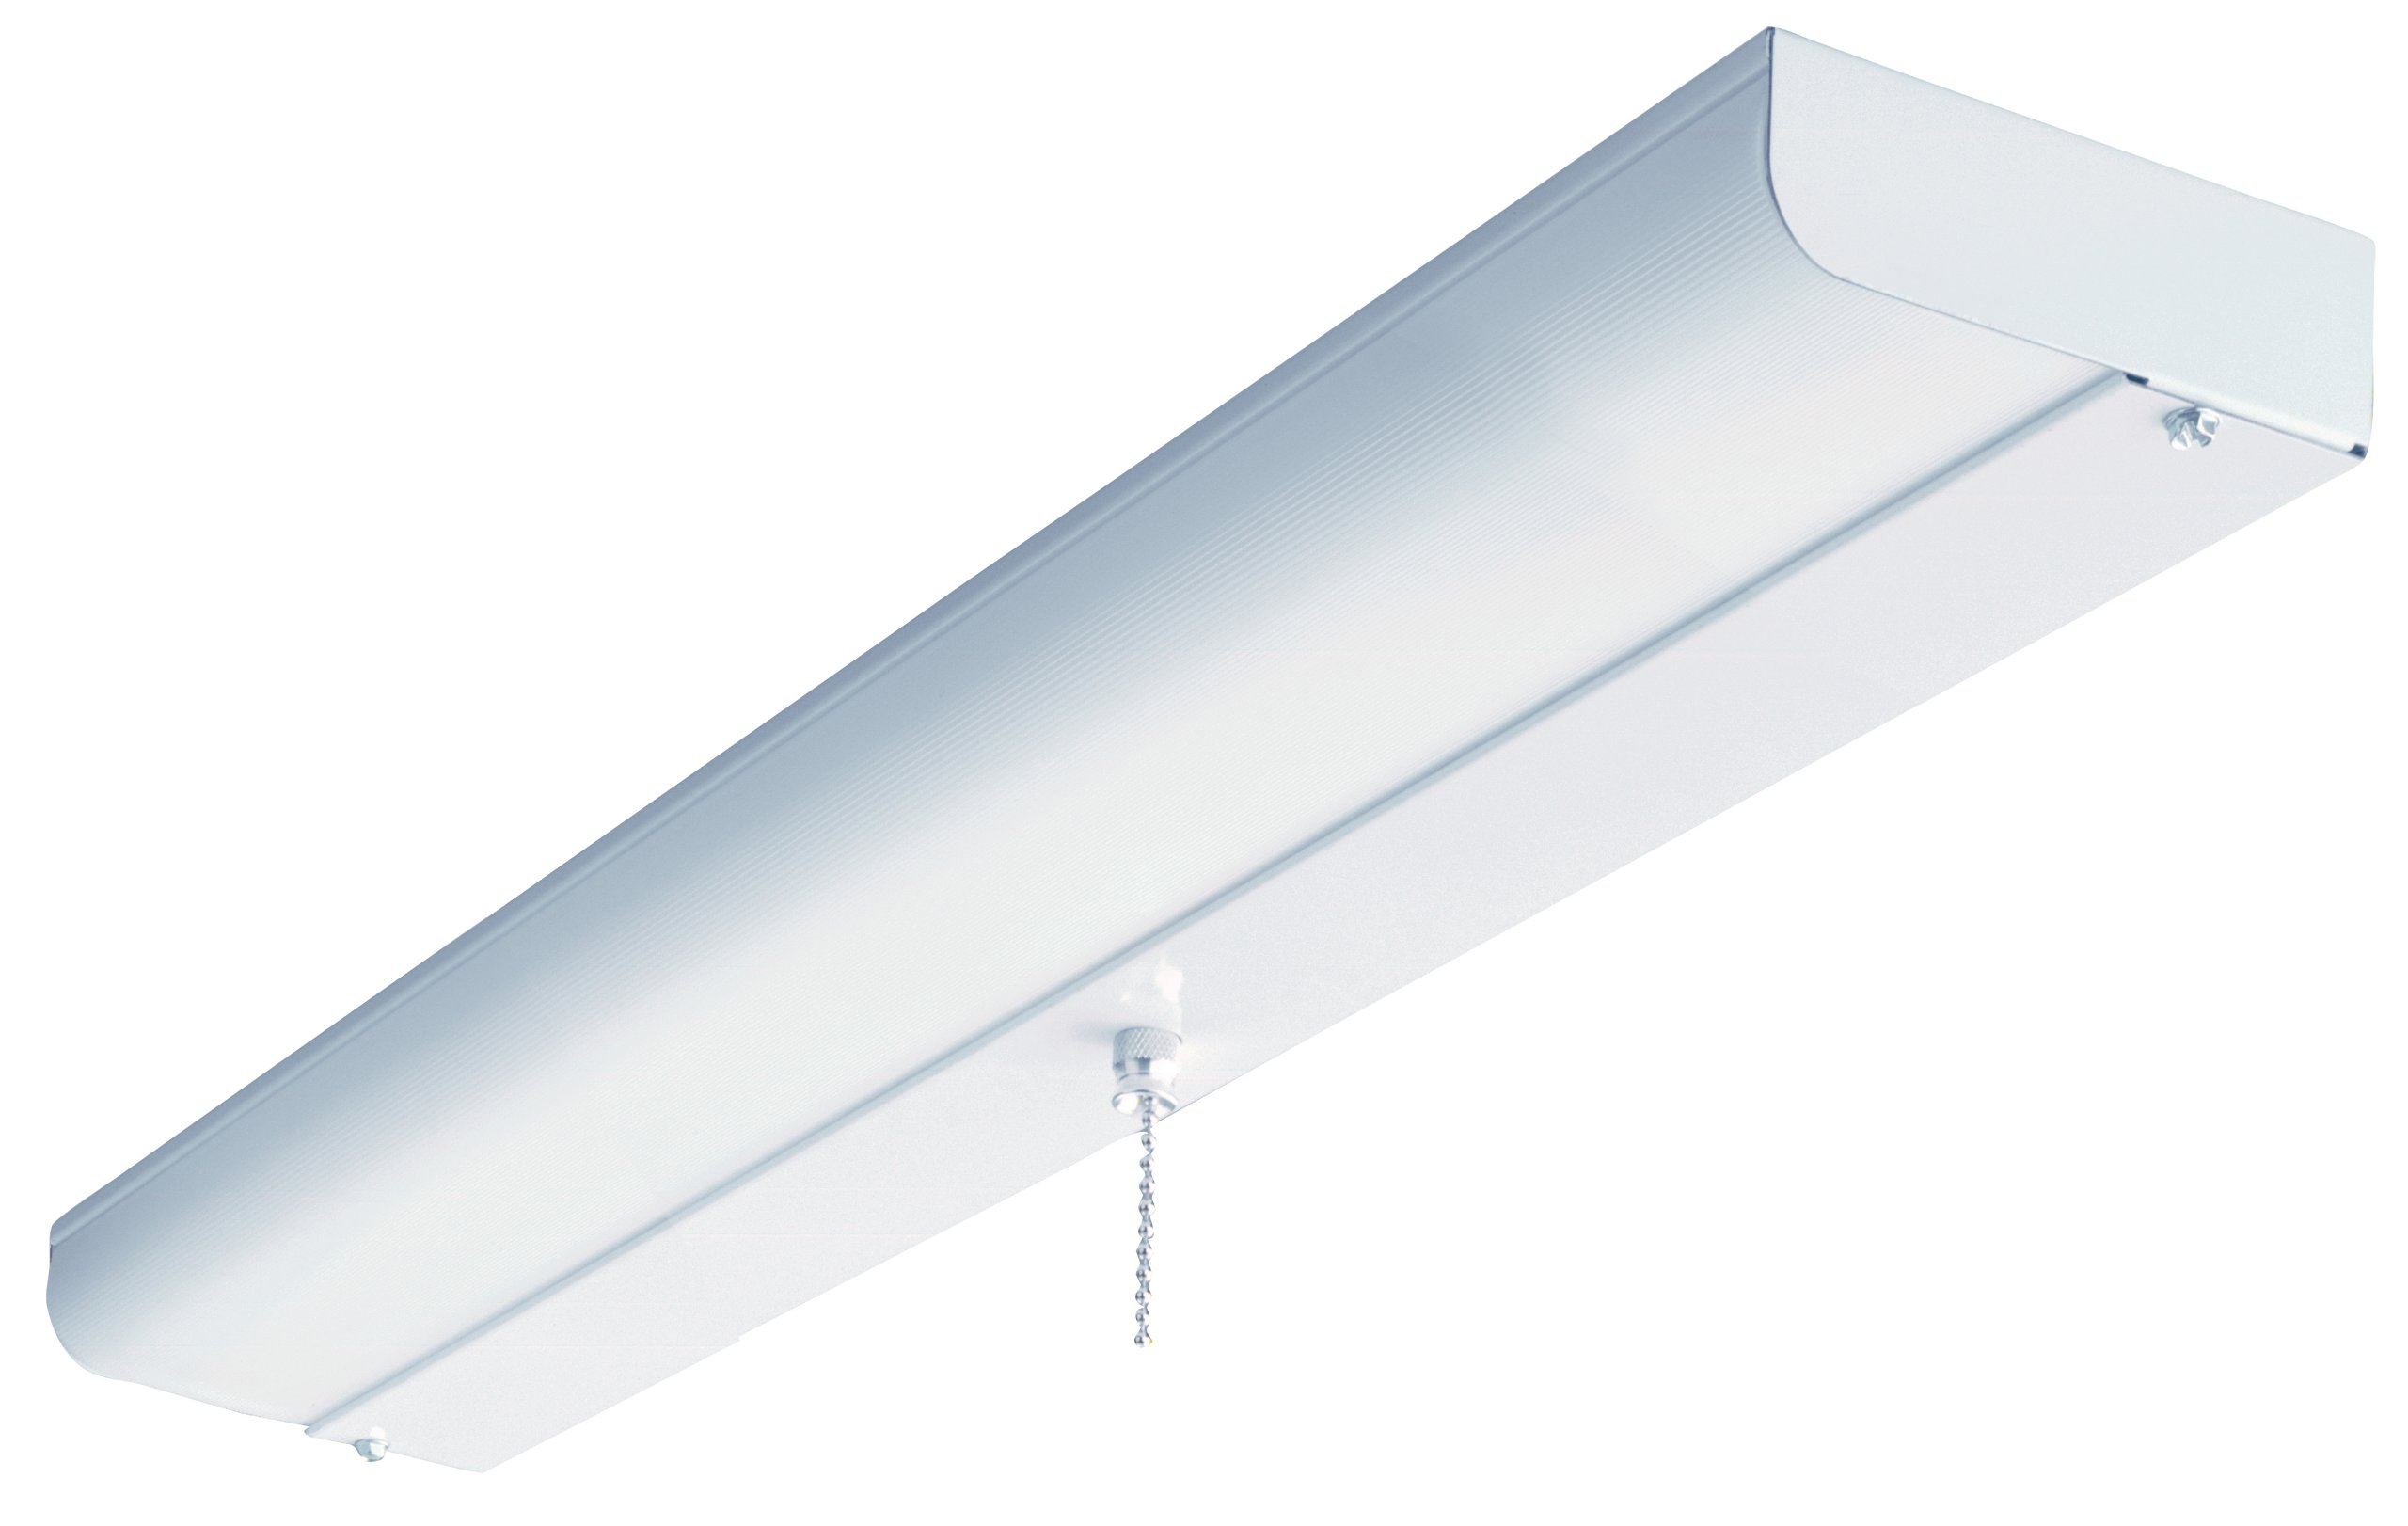 Lithonia Lighting CUC8 17 120 LP S1 M4 24-Inch 1-Light Flush Mount Fluorescent Ceiling Closet Light, White